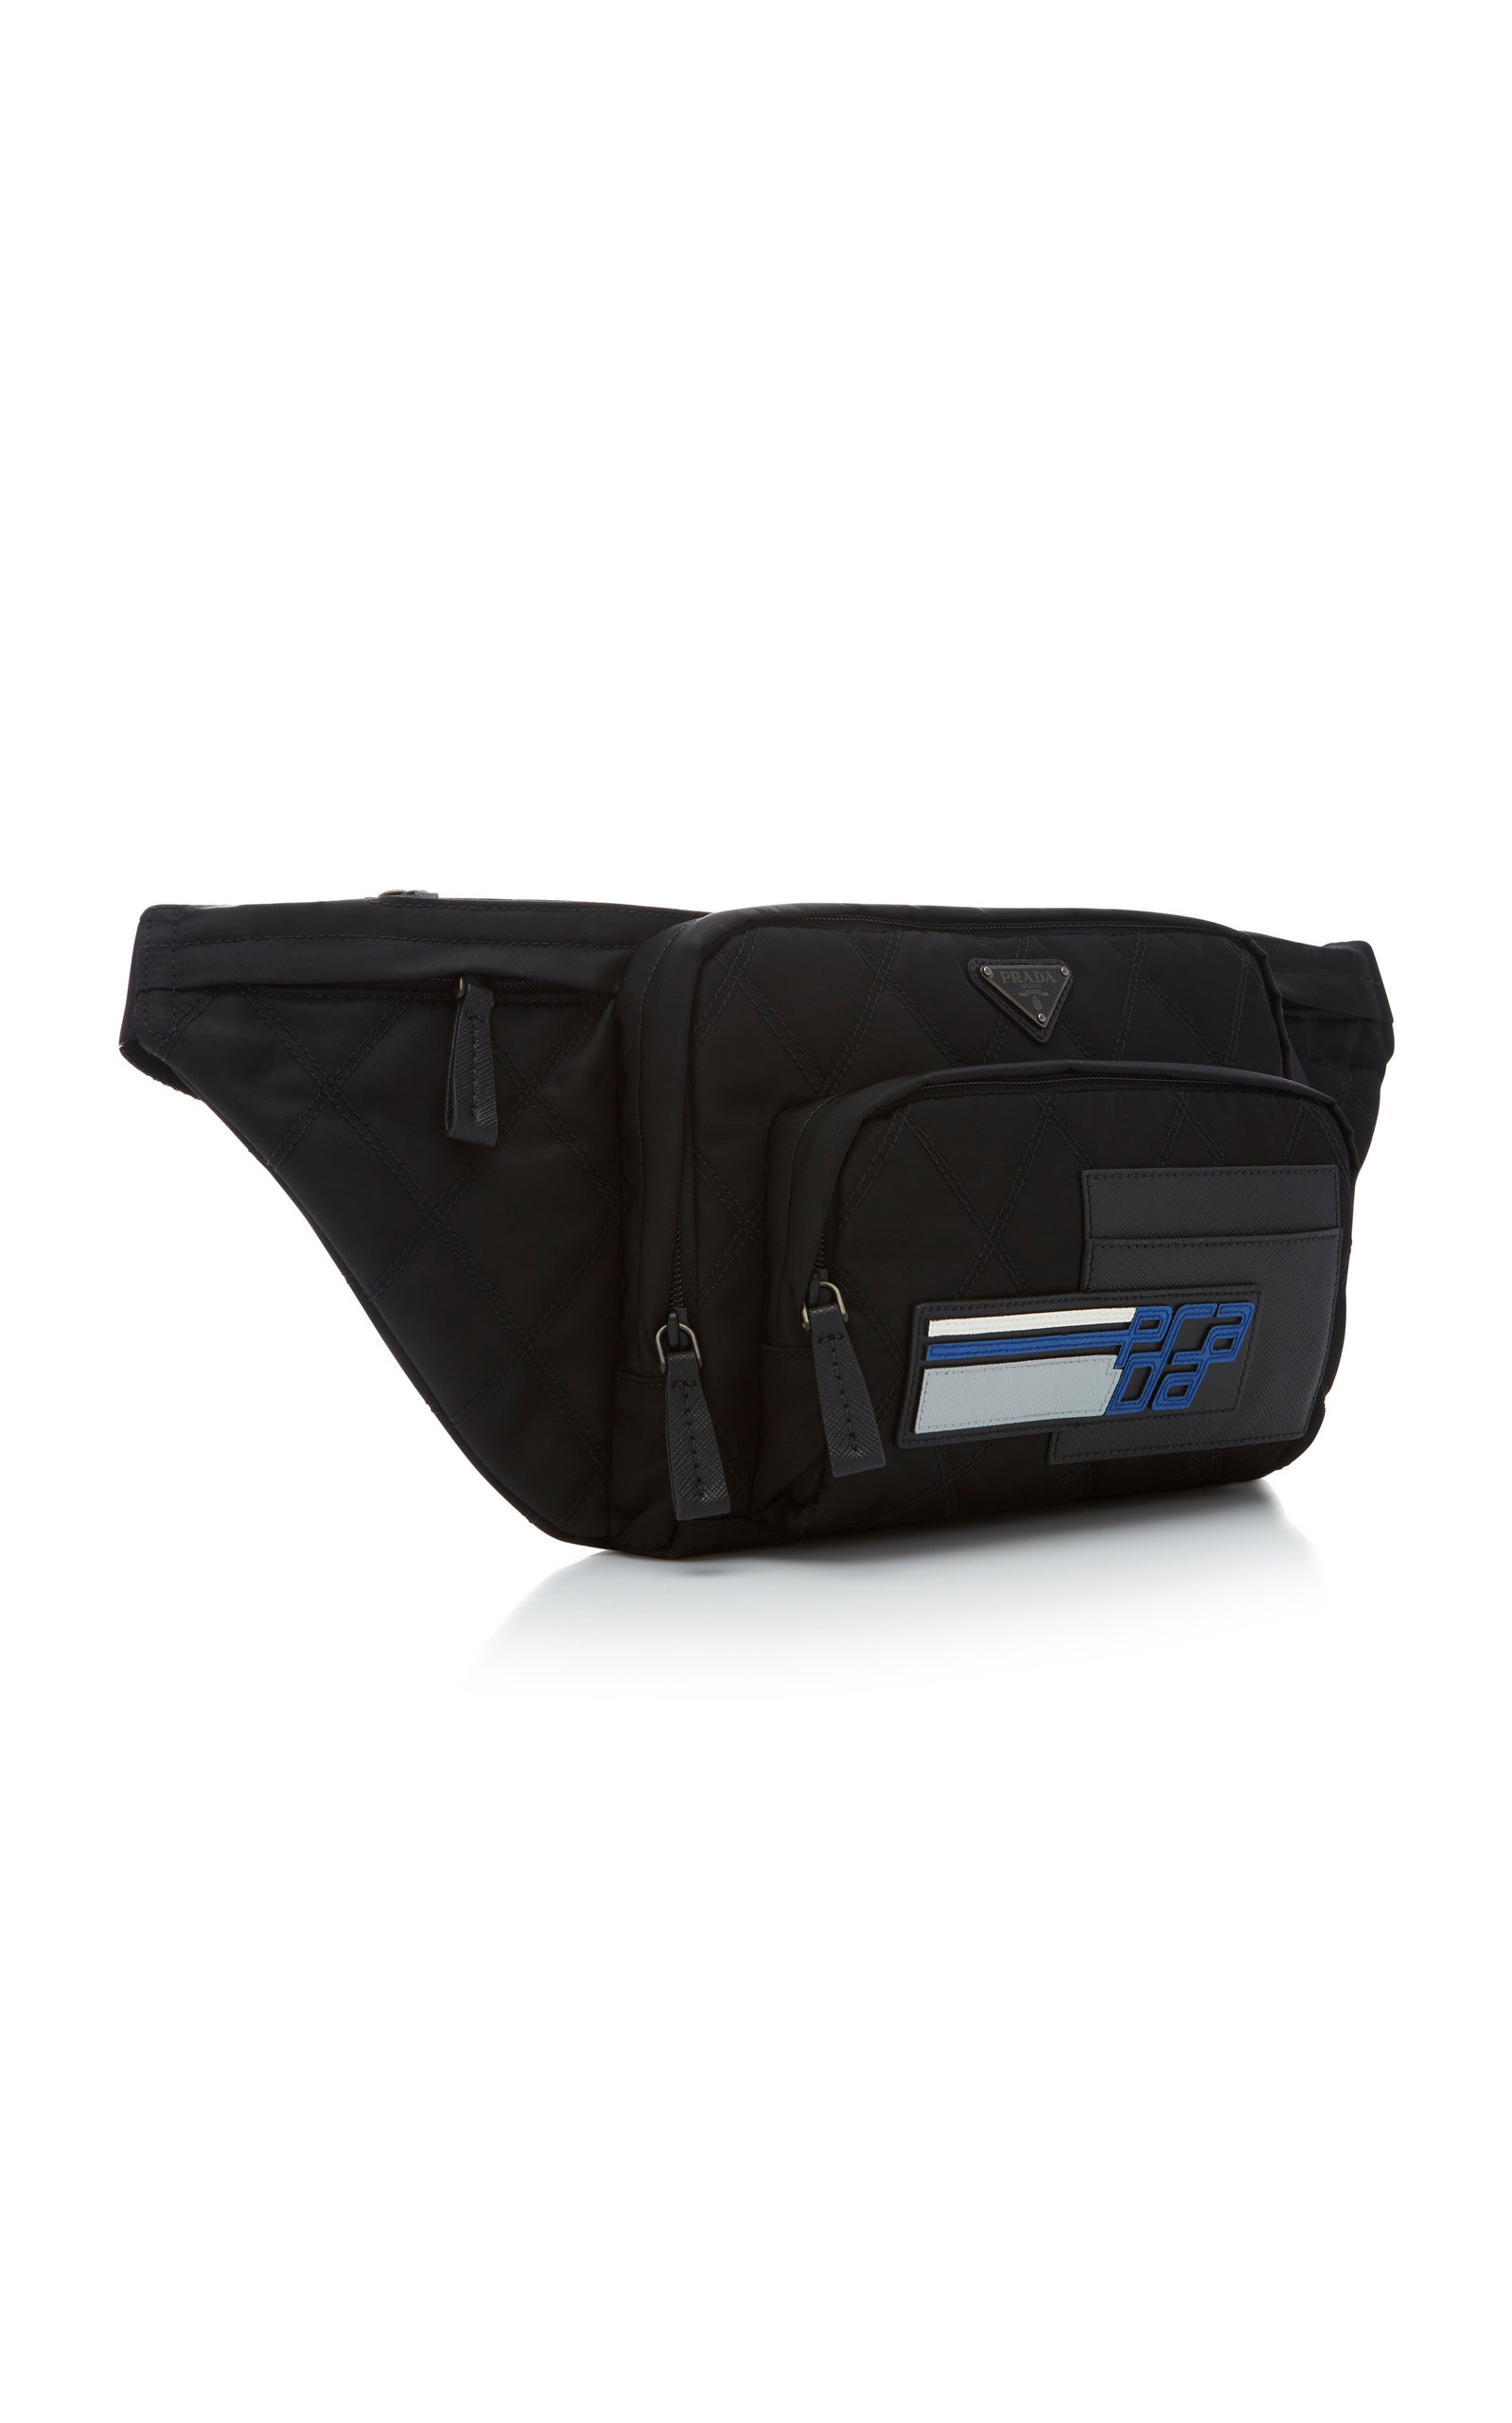 ce84075504f03d PradaQuilted Belt Bag. CLOSE. Loading. Loading